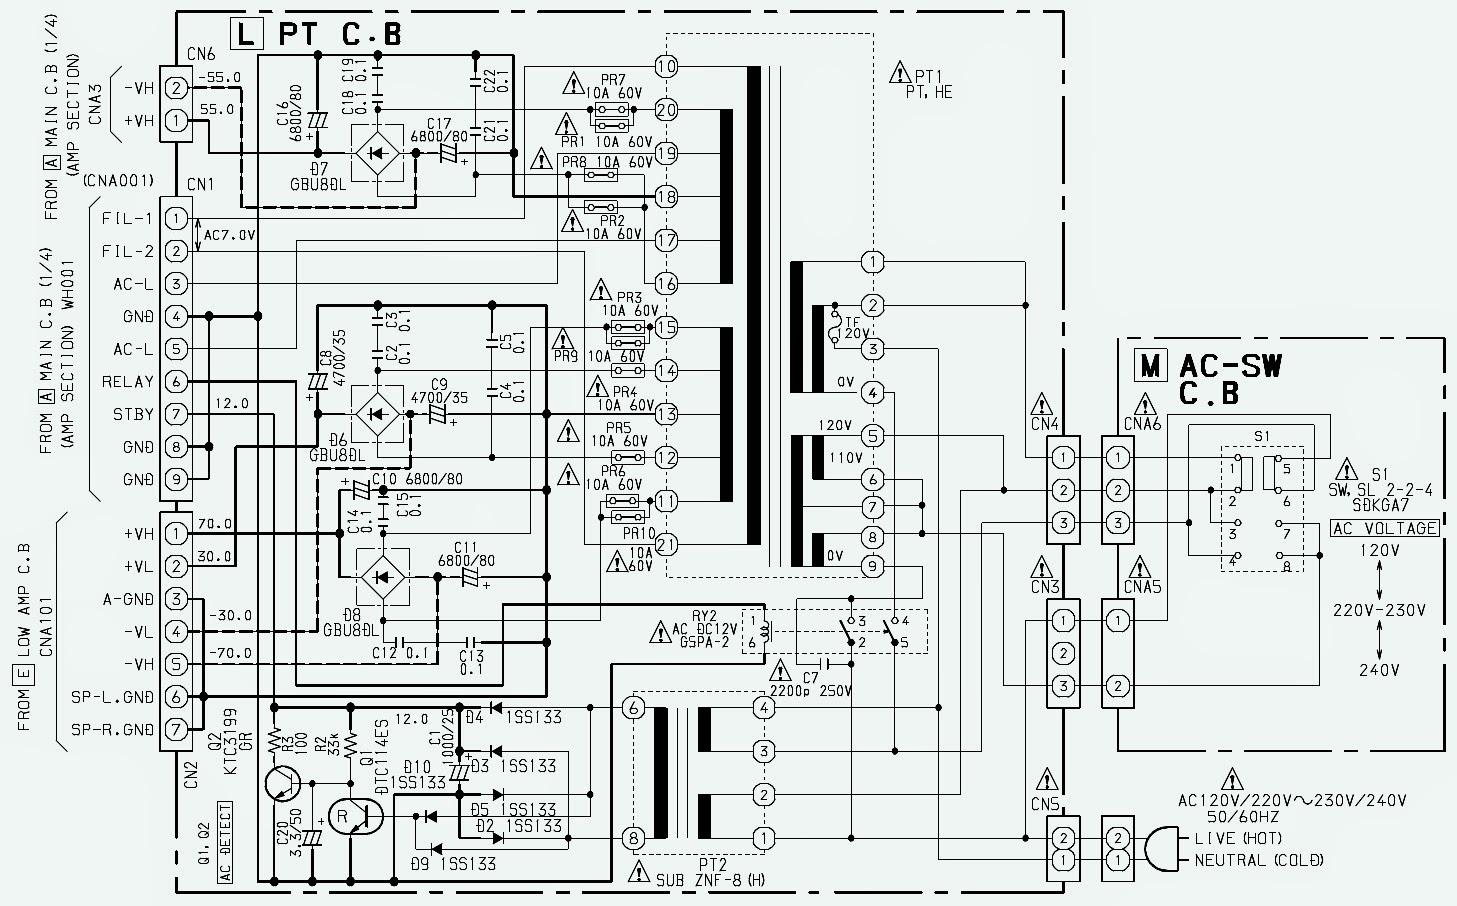 Aiwa Stereo Wiring Diagram | Wiring Diagram